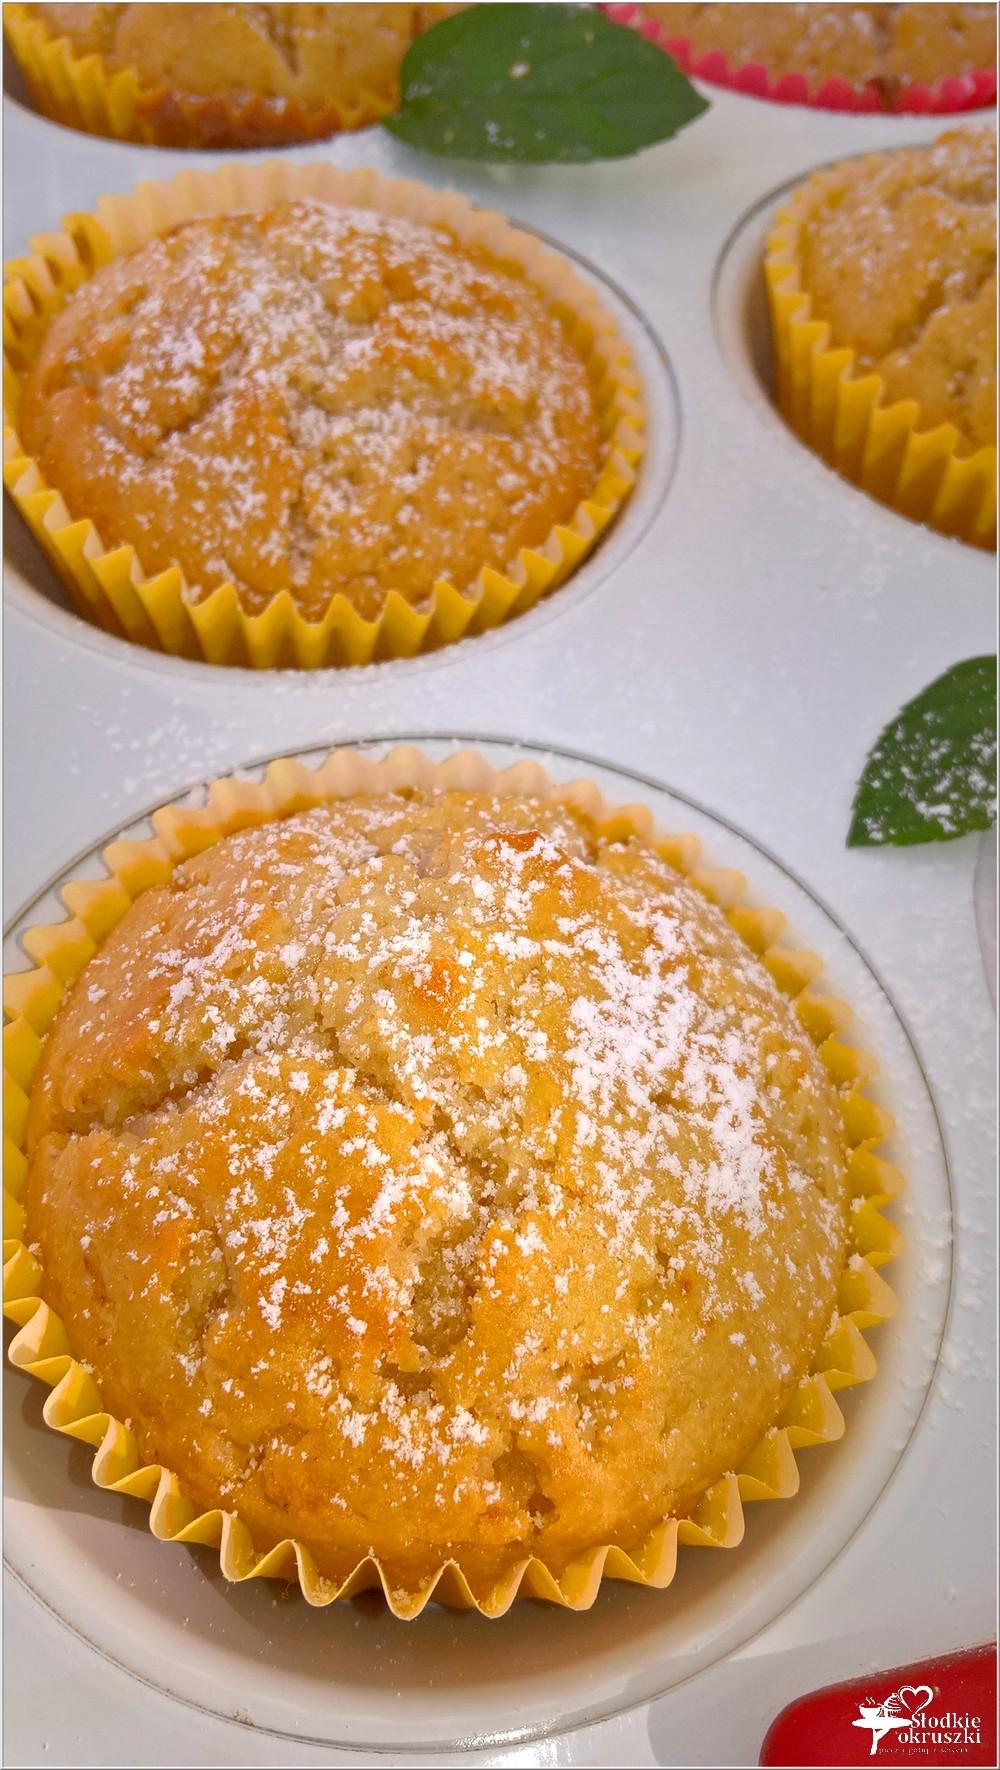 Limonkowe muffinki do kubka gorącego kakao (4)